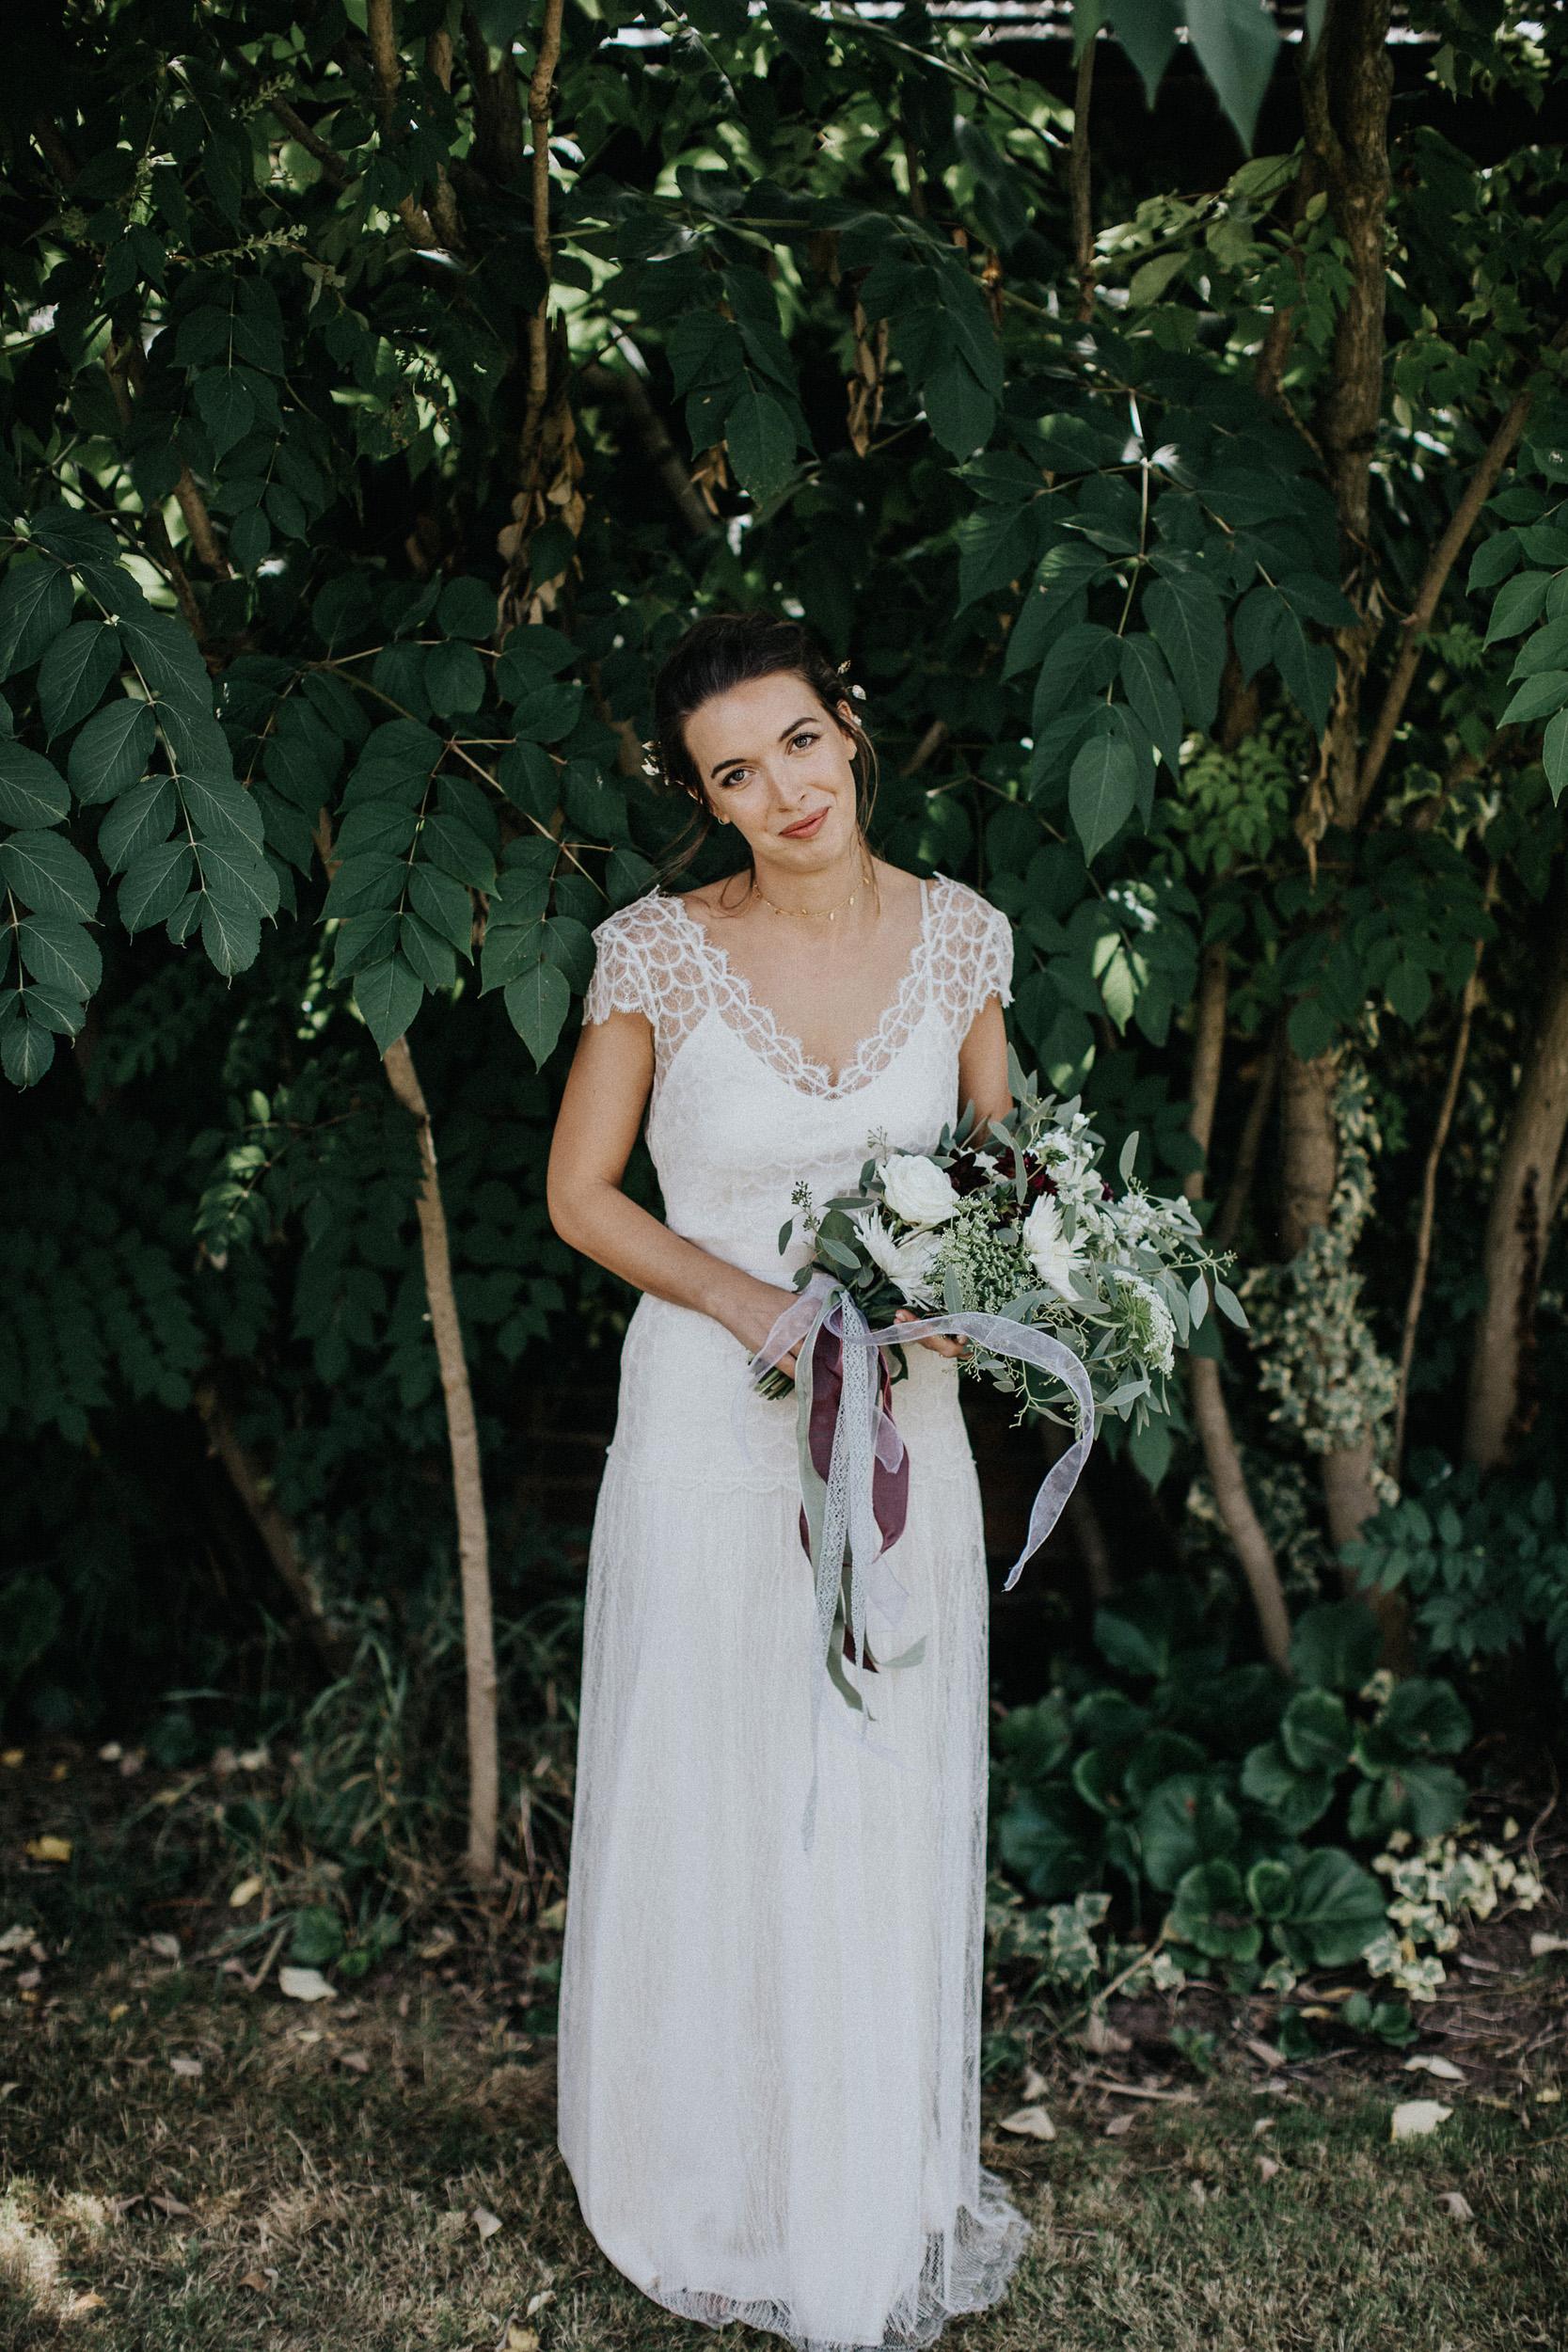 Martha-Laid-Back-Garden-Wedding-Lace-Wedding-Dress-Bohemian-Kate-Beaumont-7.jpg